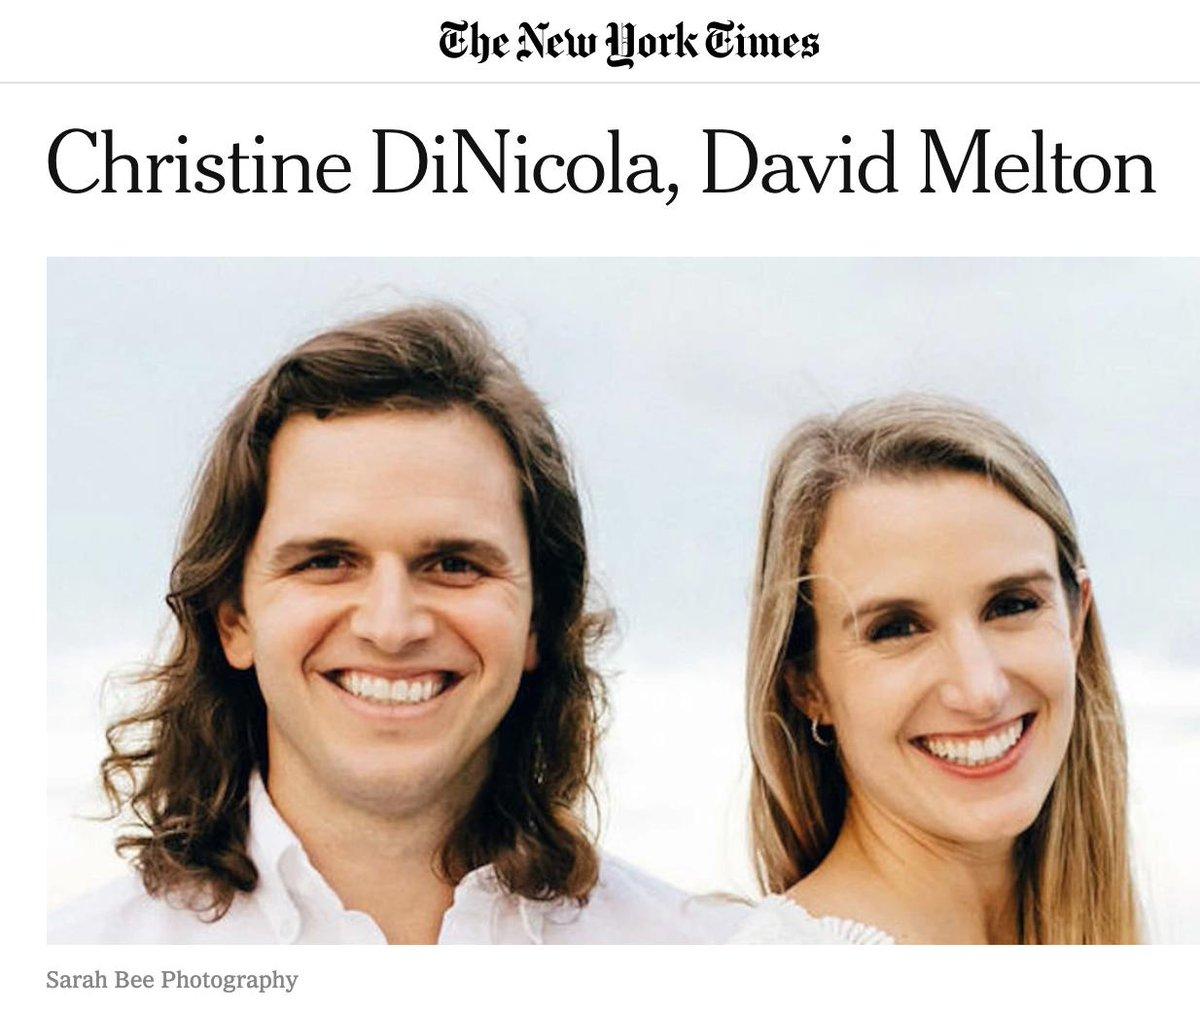 New York Times Wedding Announcement.Lkld Now On Twitter From The Nytimes A Wedding Announcement